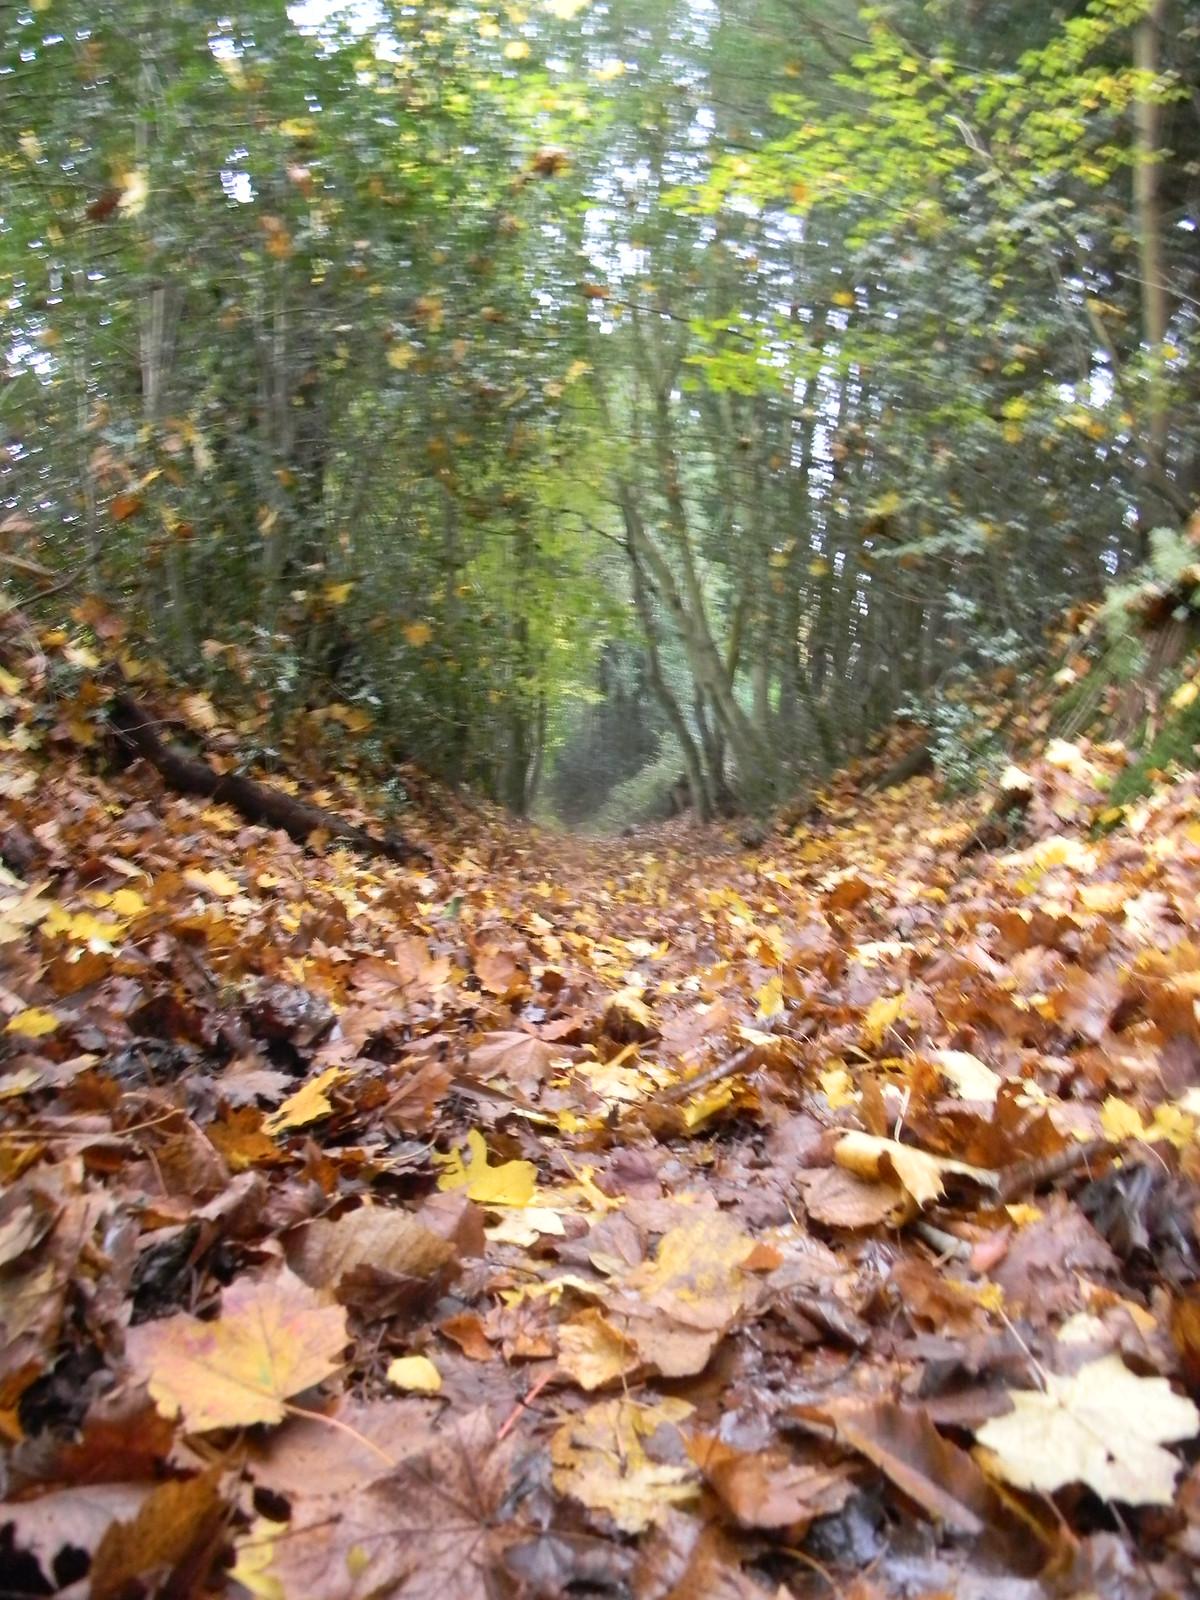 Leaves on the path Farnham to Godalming Wednesday Walk